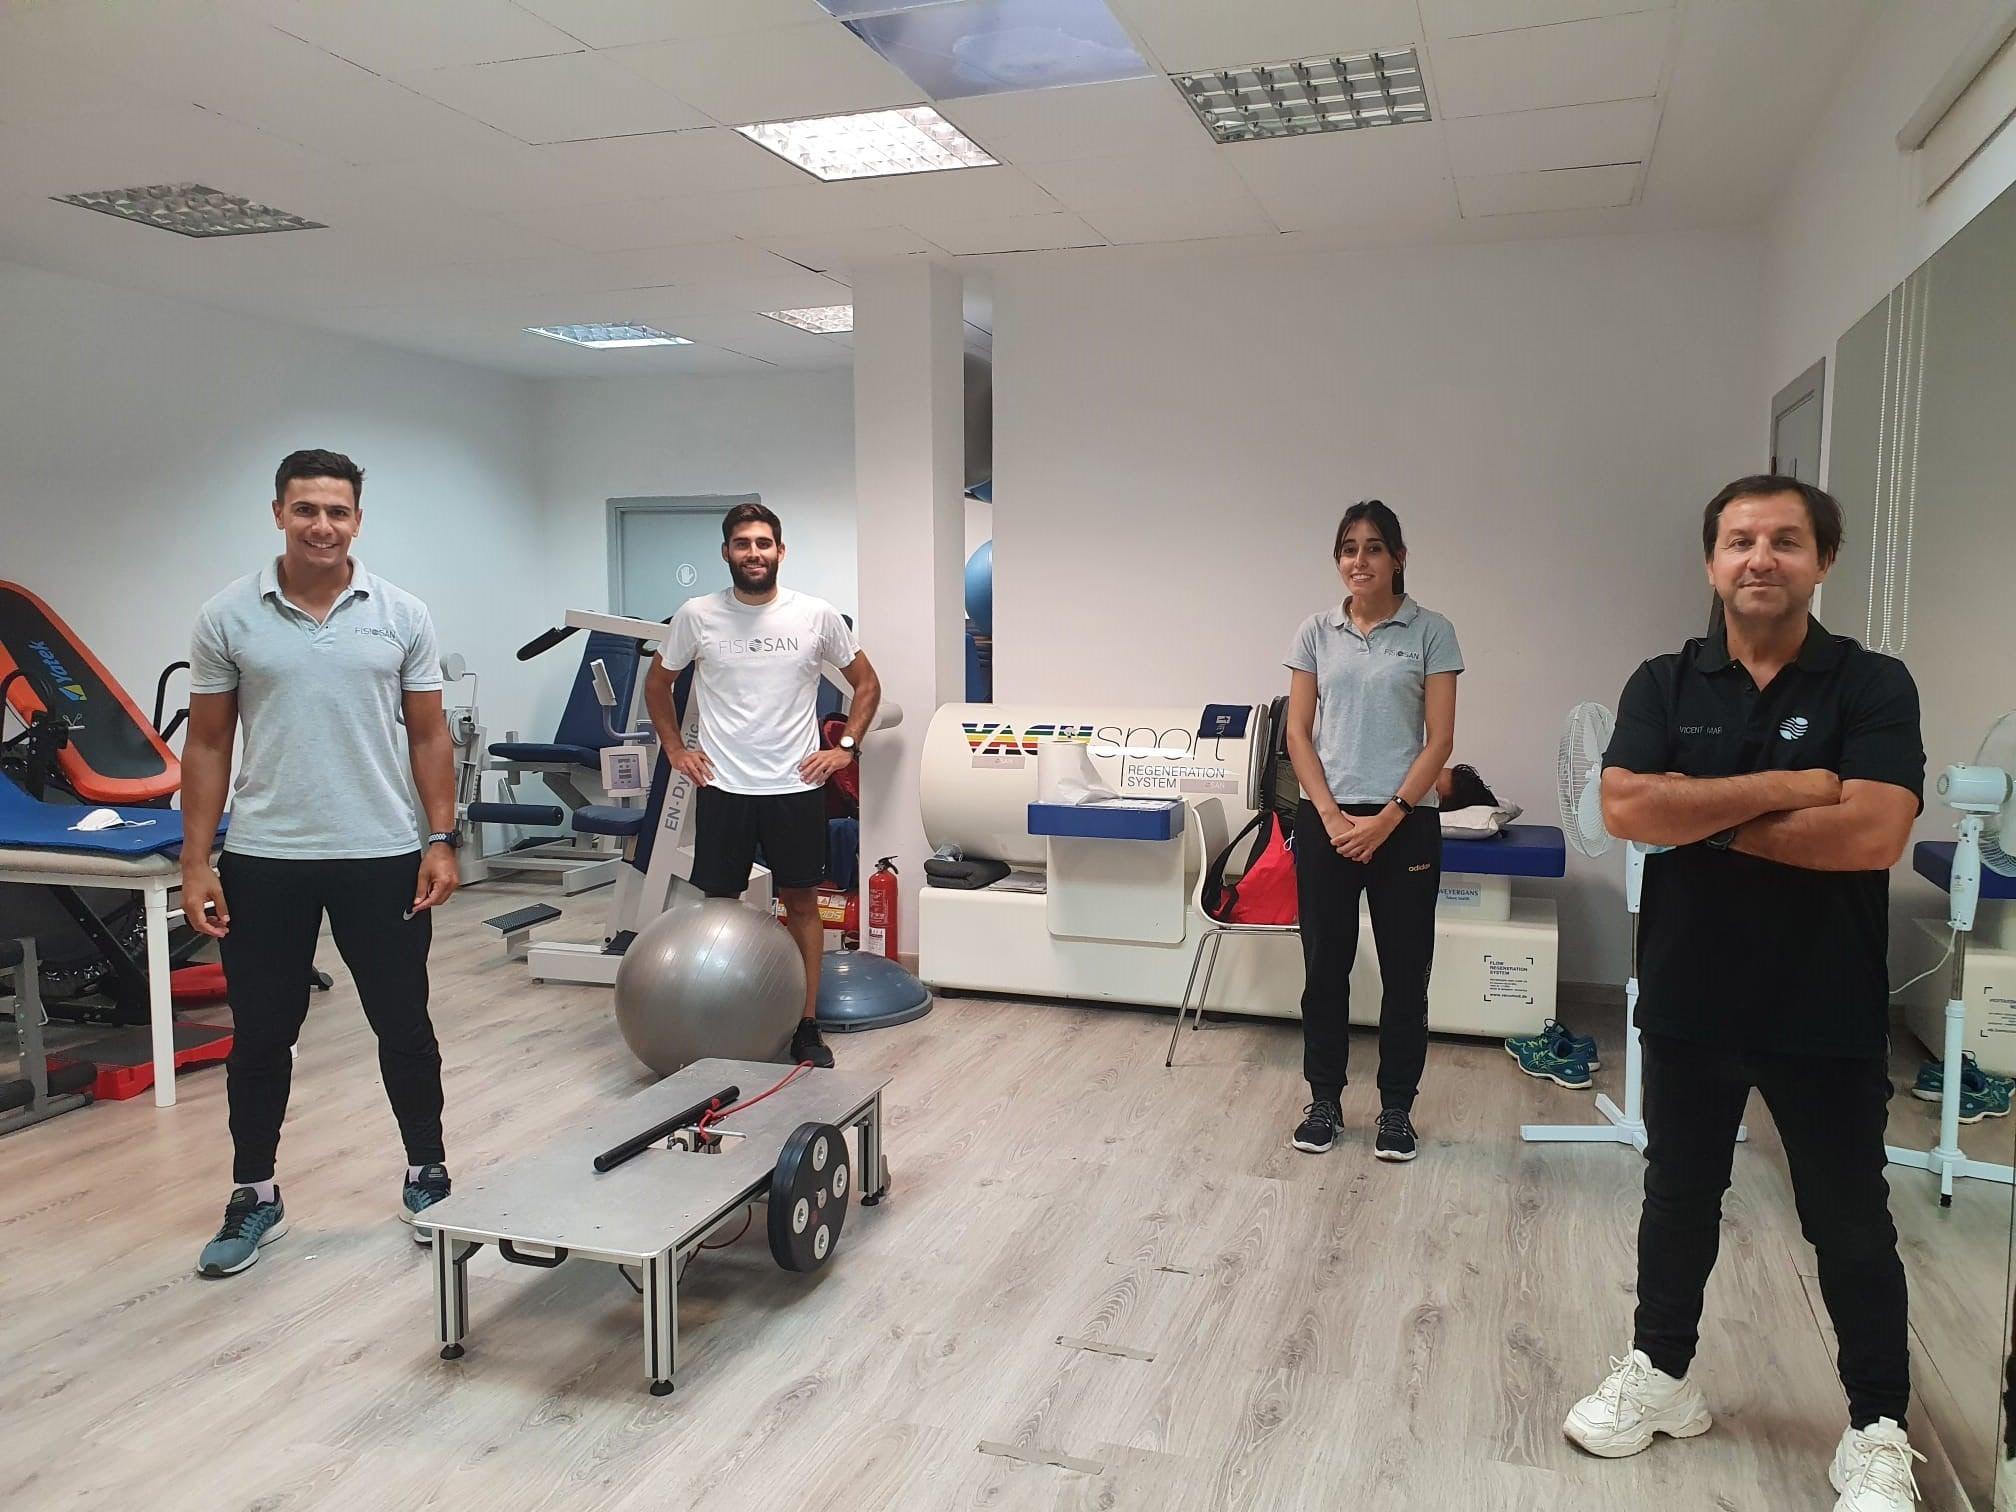 Fisioterapia de vanguardia para cuidar de tu bienestar - Vicent Marí, fisioterapeuta en Palma de Mallorca.